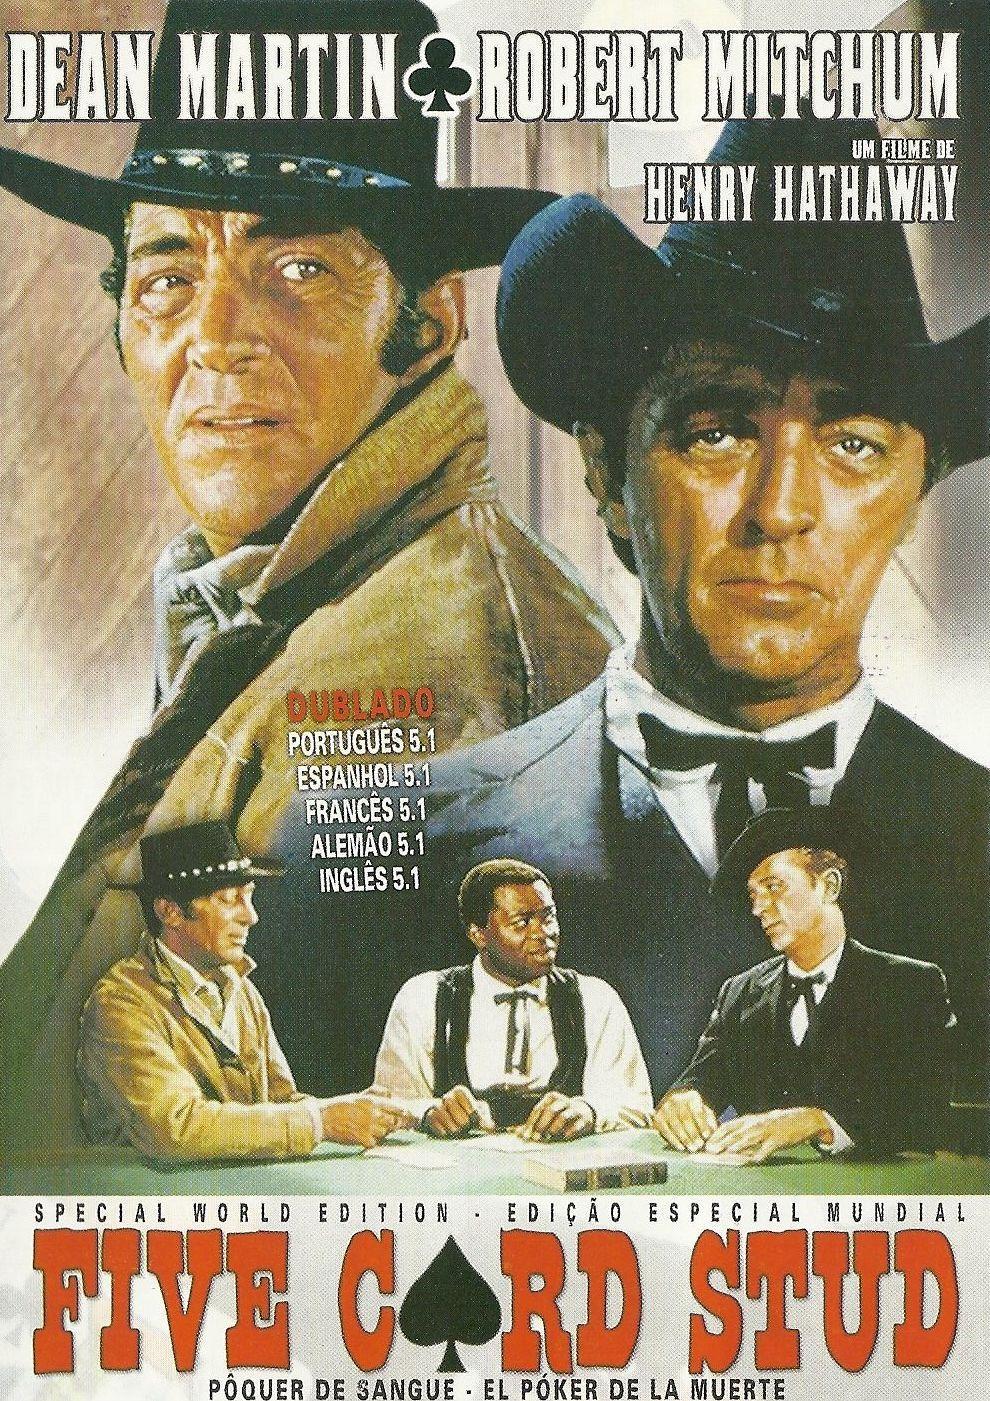 Dean Martin Robert Mitchum Cowboy Marlonndo Evaristo Marquez Norman Hill Thomas Lyons Five Card Stud